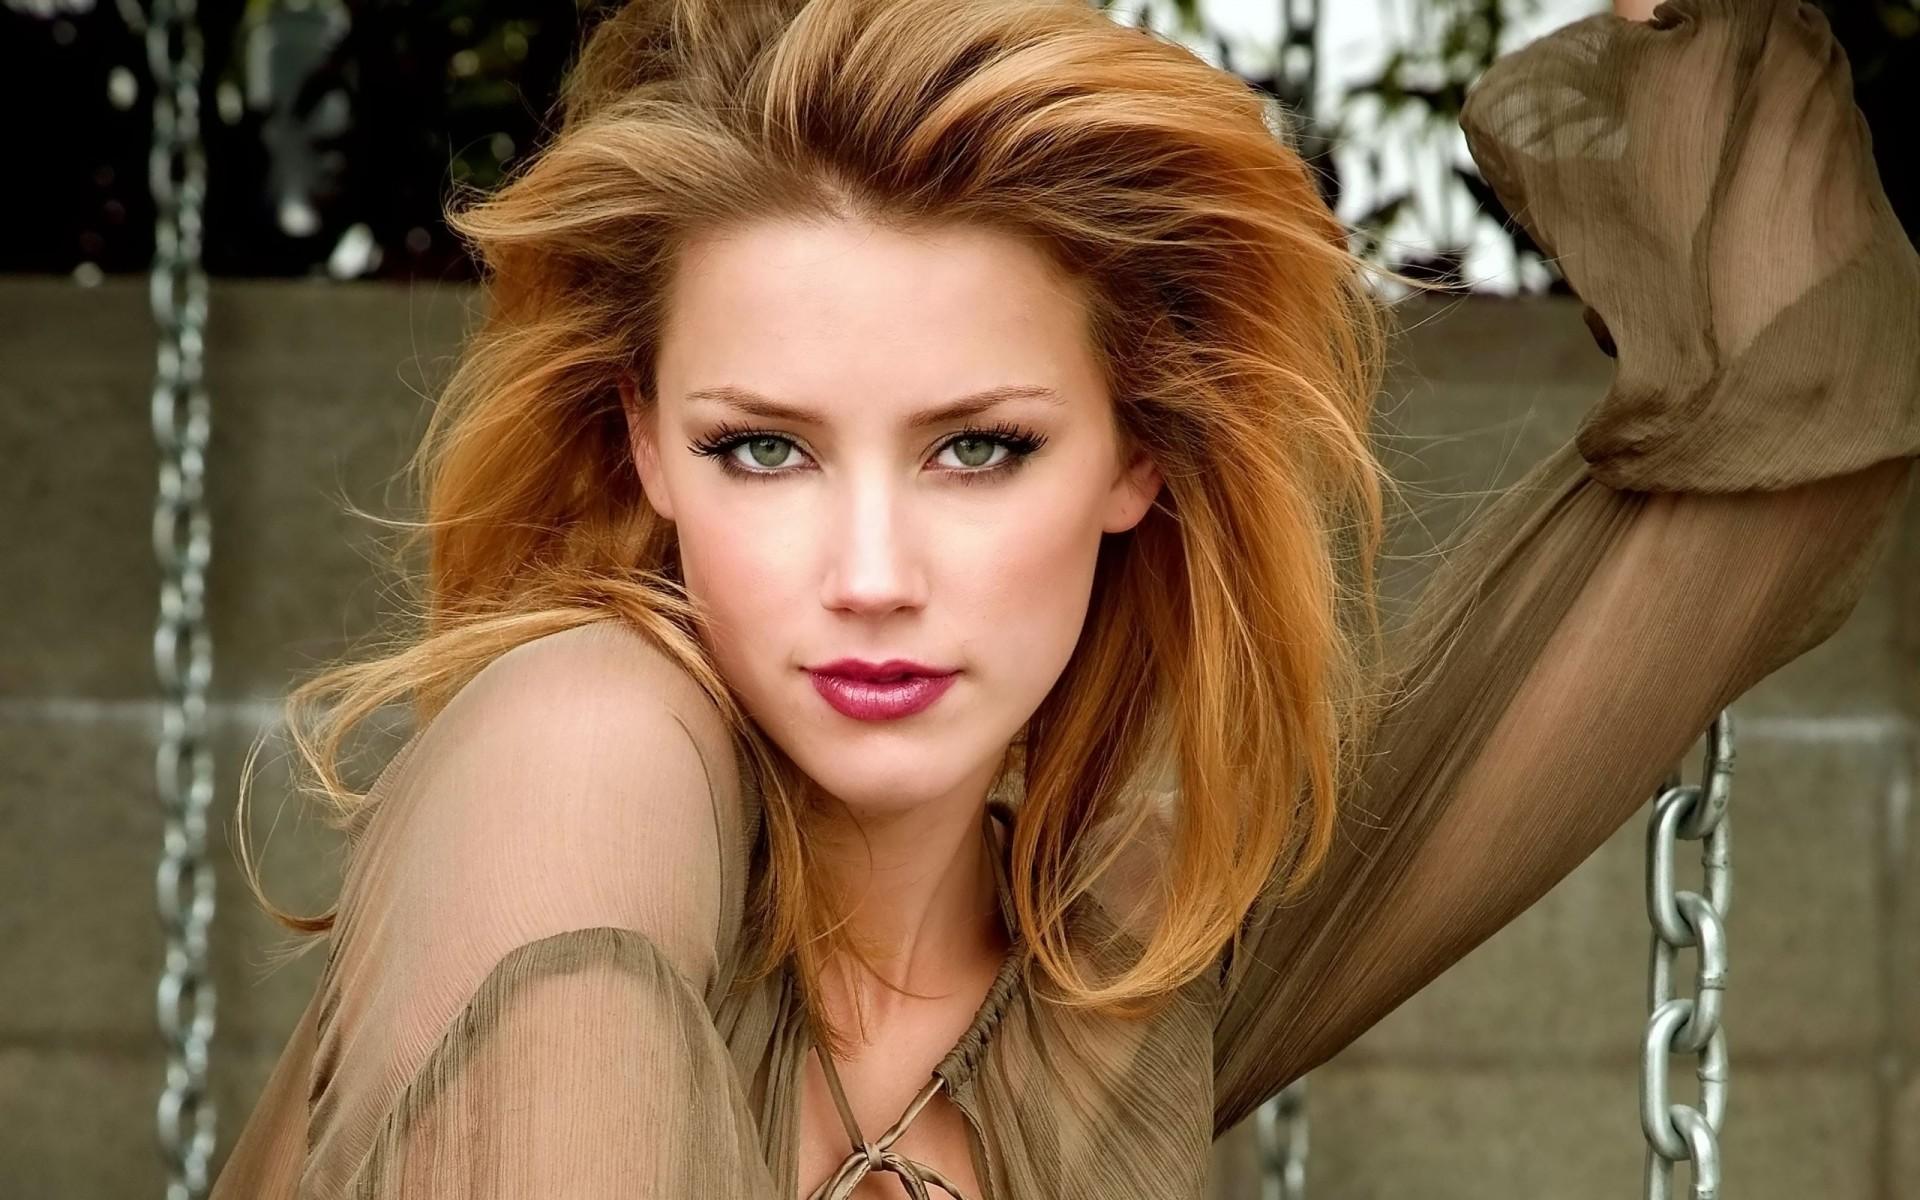 Amber Heard Wallpapers (+10)